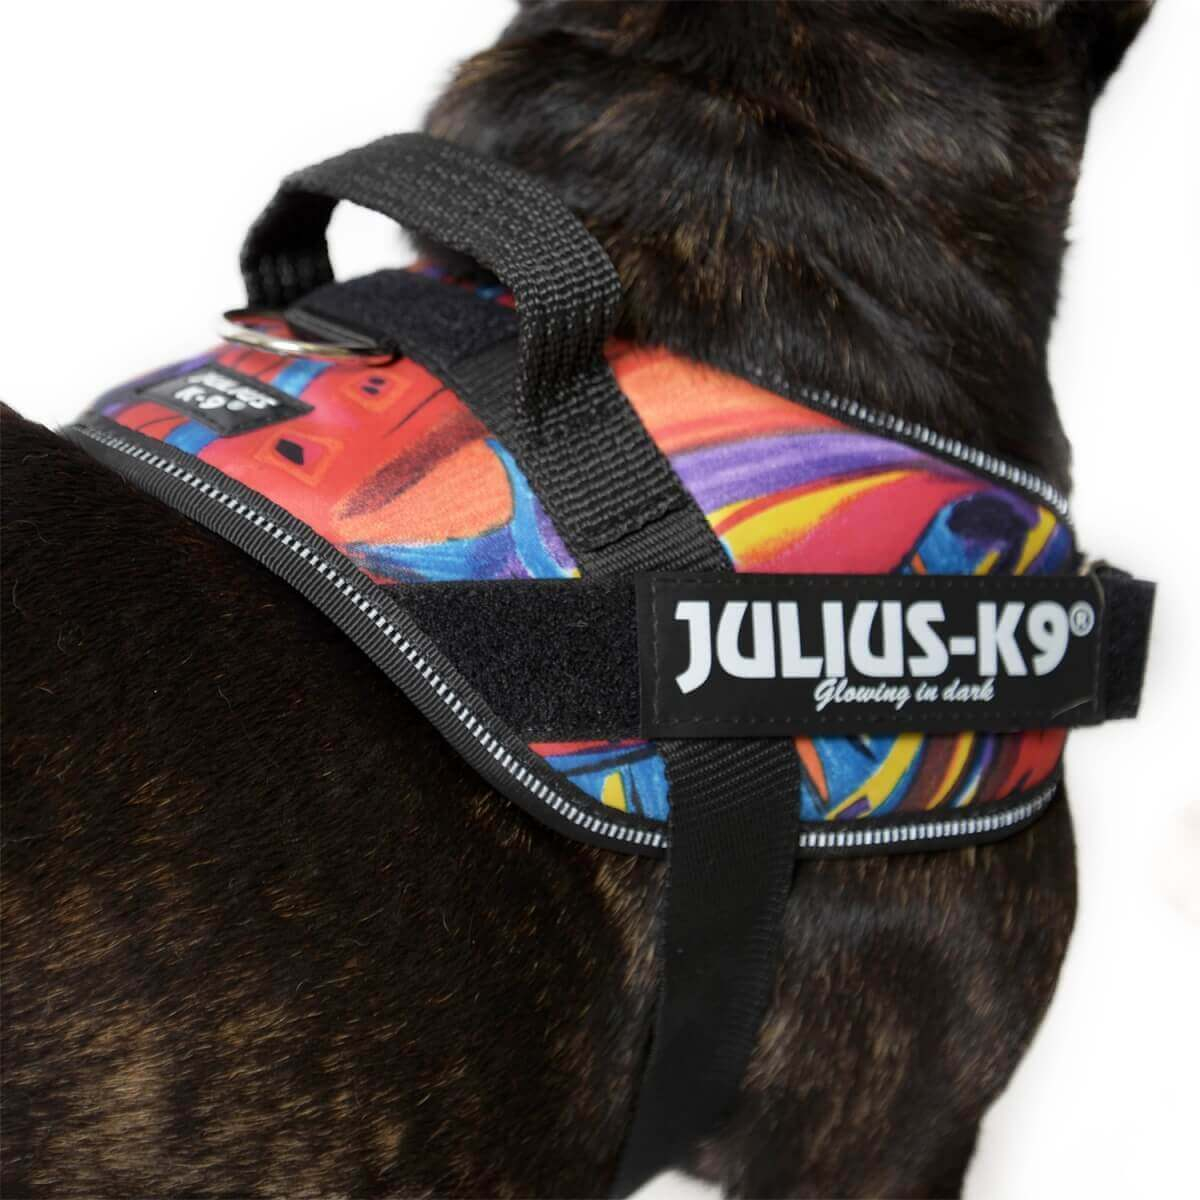 Harnais Julius K9 IDC EDITION SPECIALE Violet Psycho Canis_2